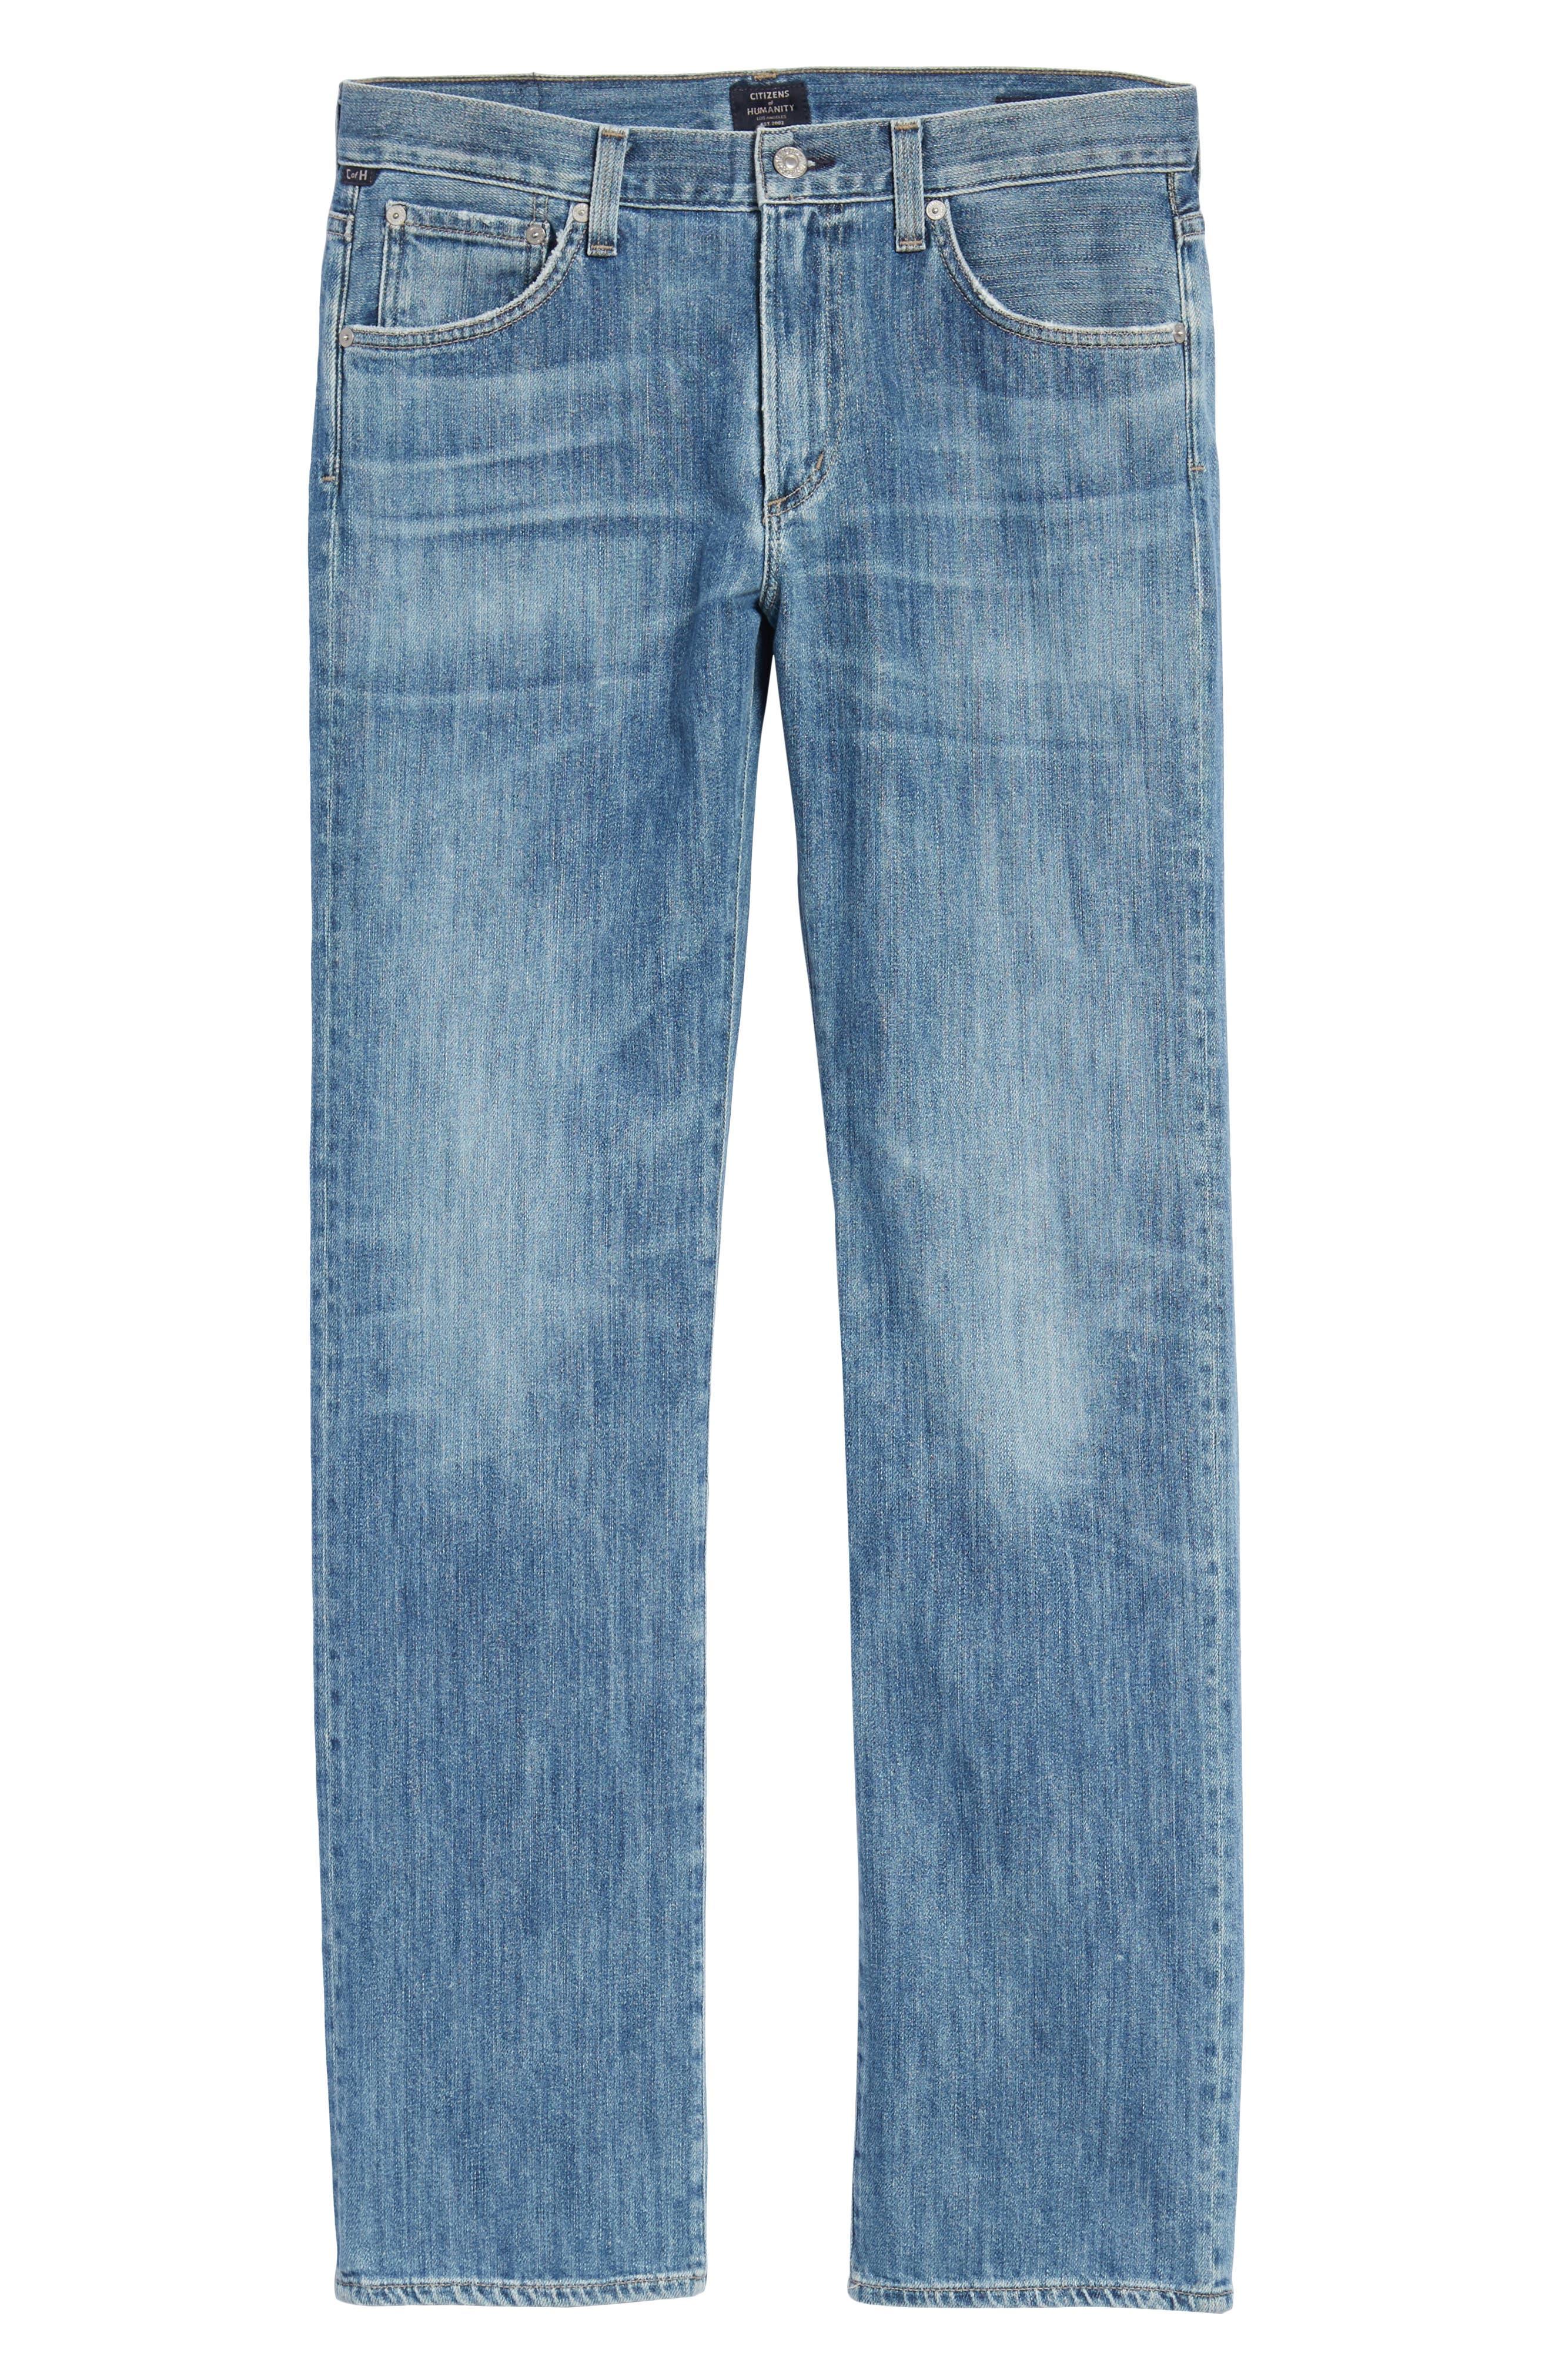 Sid Straight Leg Jeans,                             Alternate thumbnail 6, color,                             456